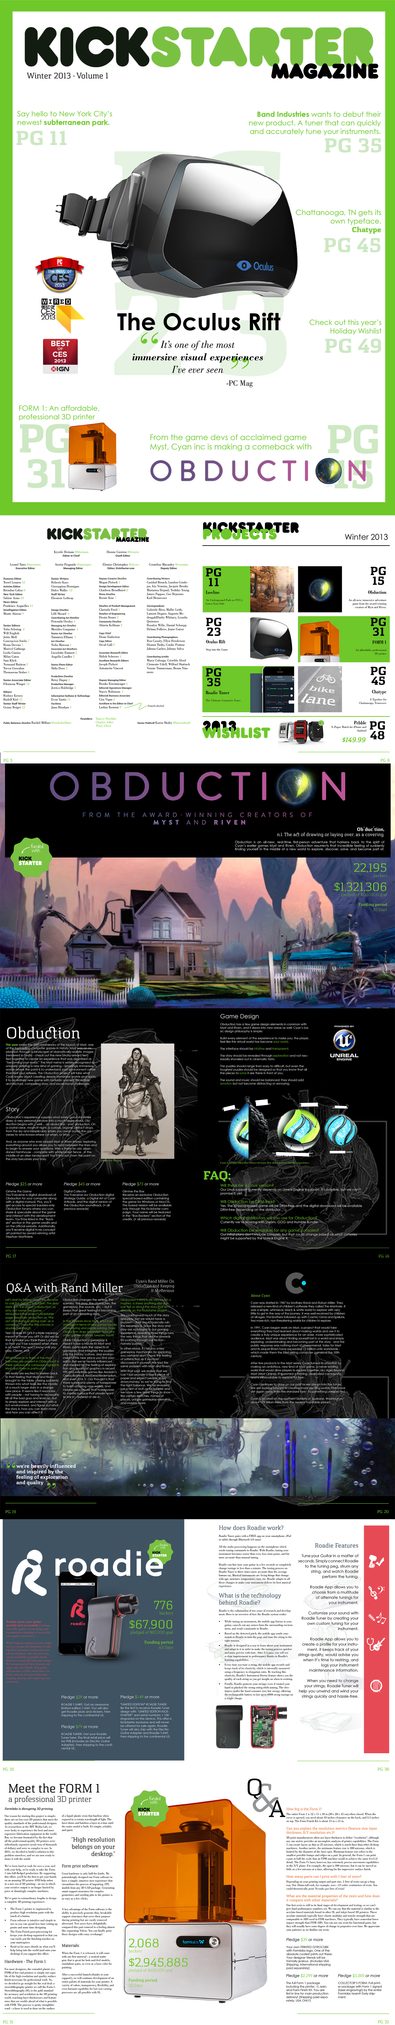 Kickstarter Magazine by chrisringeisen